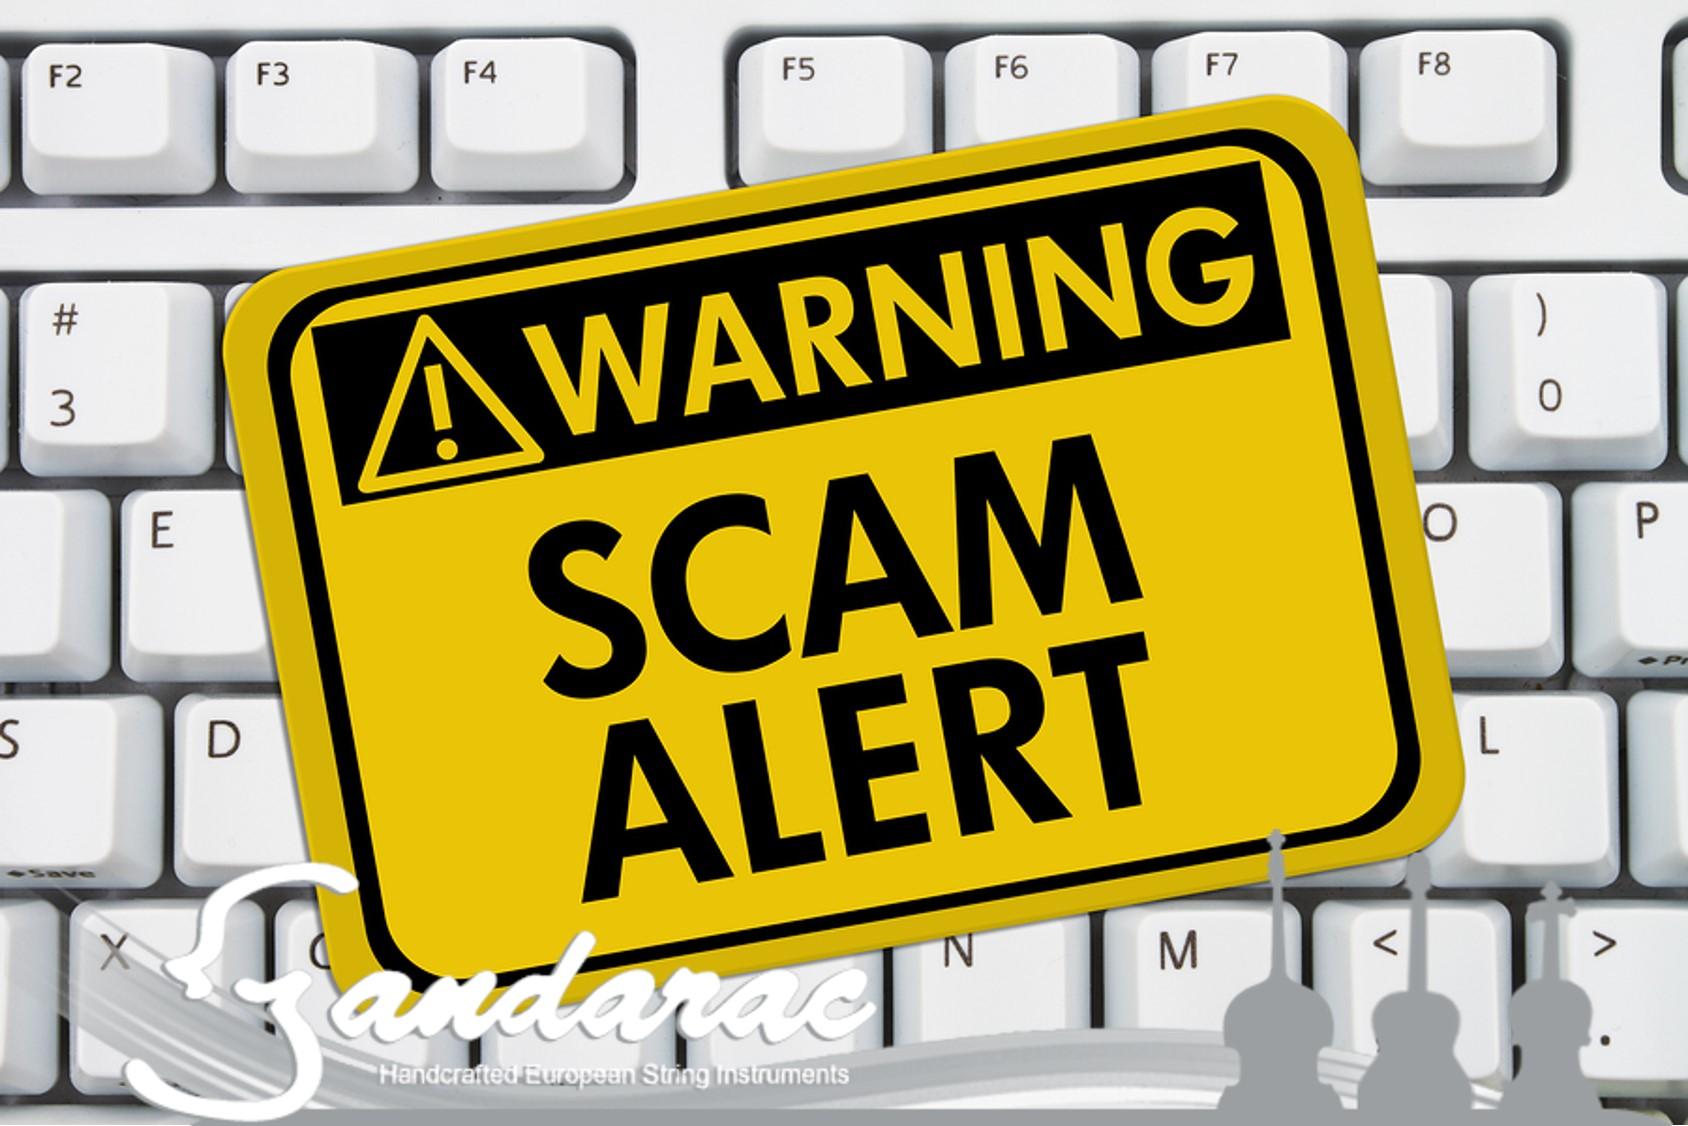 02 - scam alert